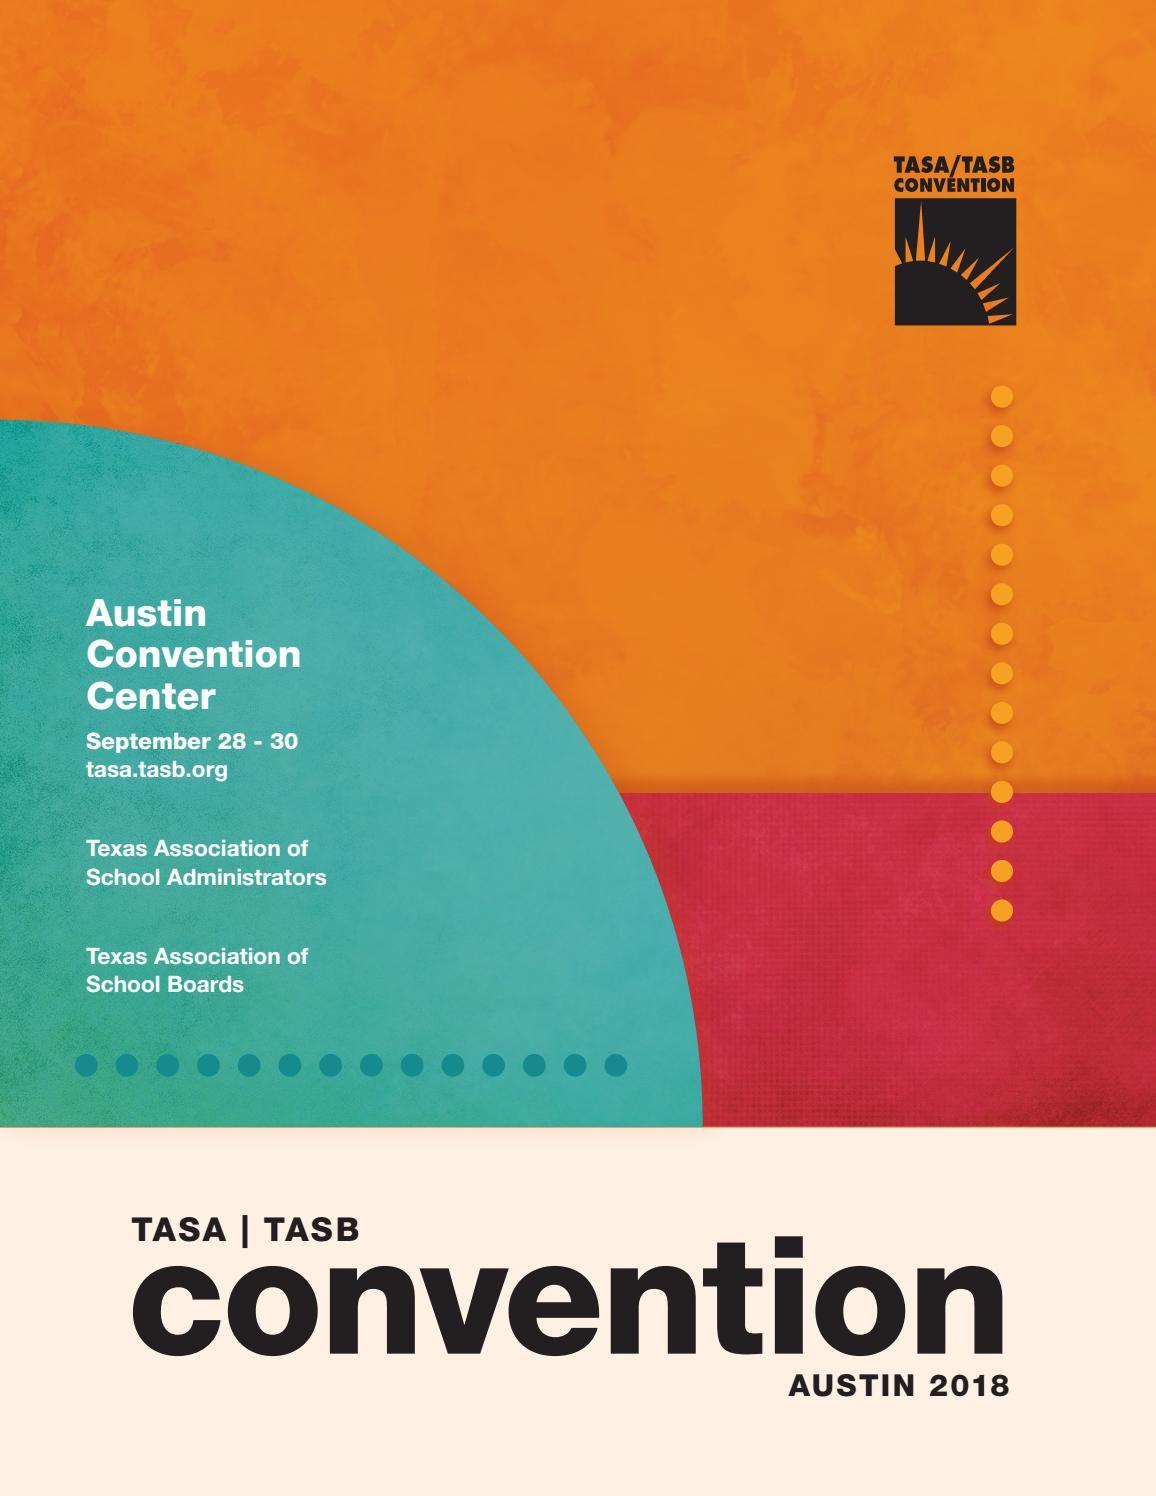 TASA/TASB Convention Program by Texas Association of School